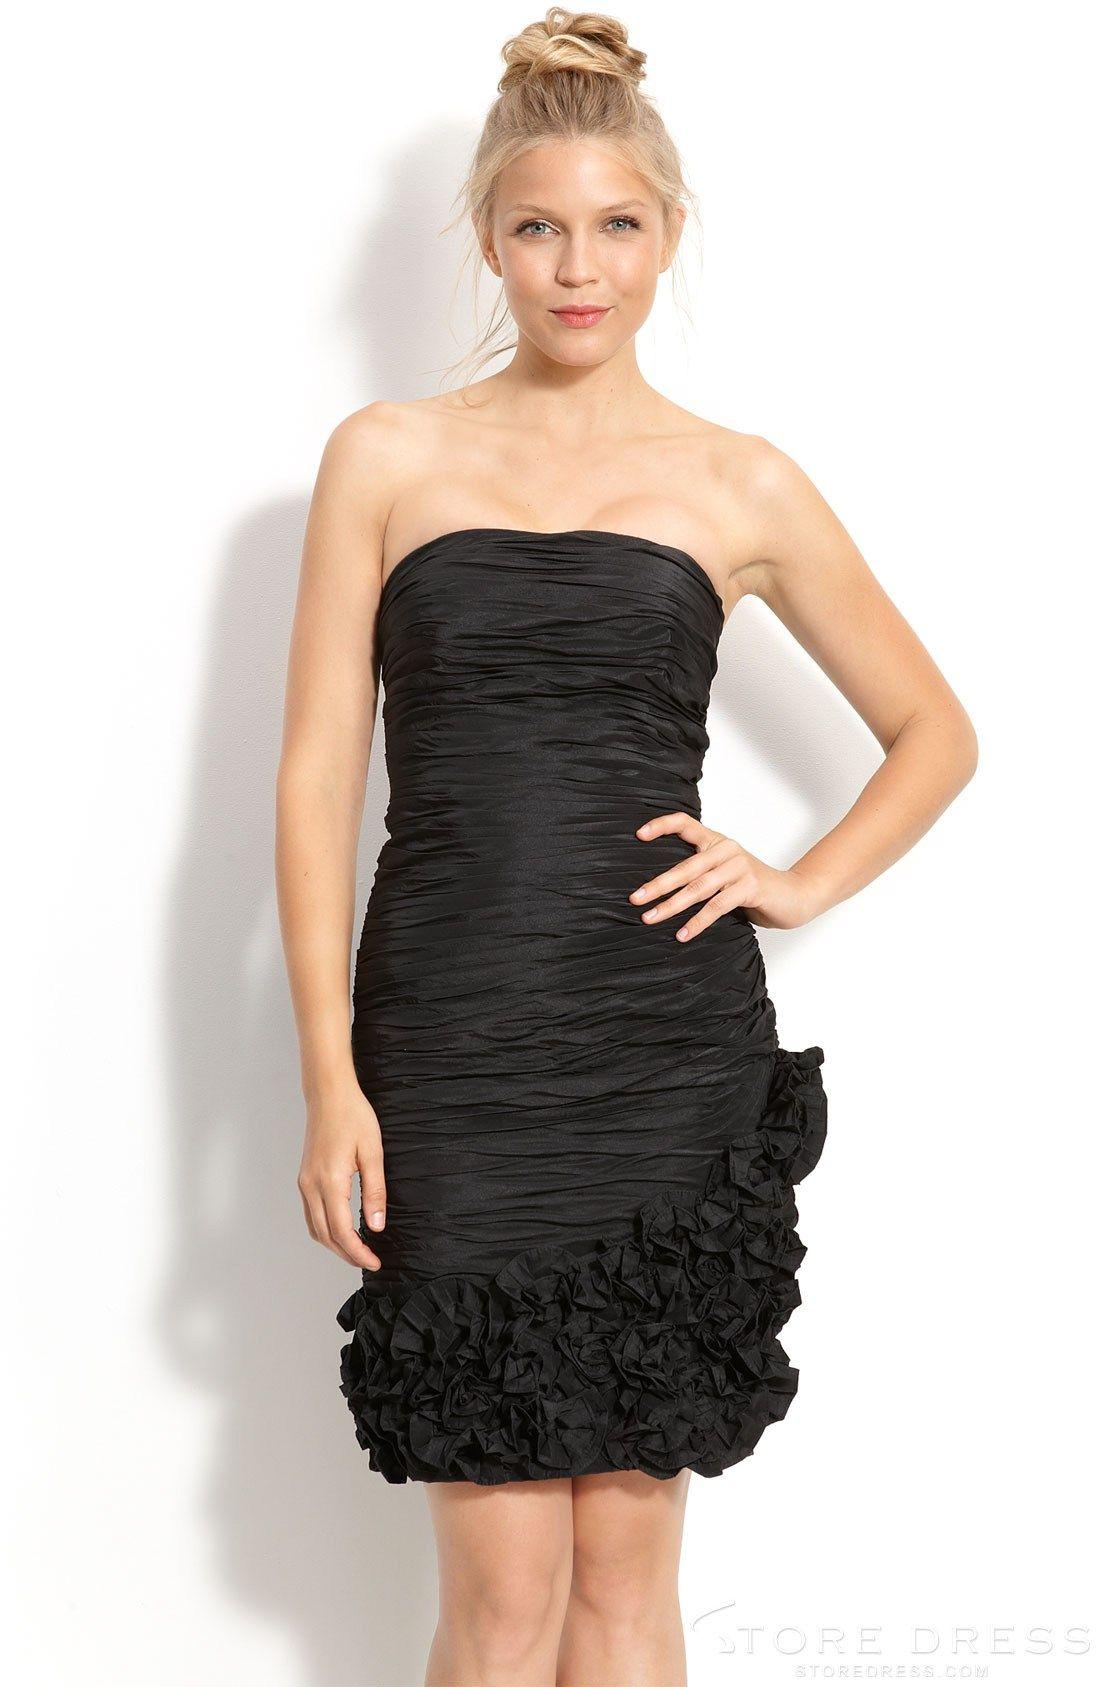 Strapless Sheath Knee Length Bridesmaid Dress with Black